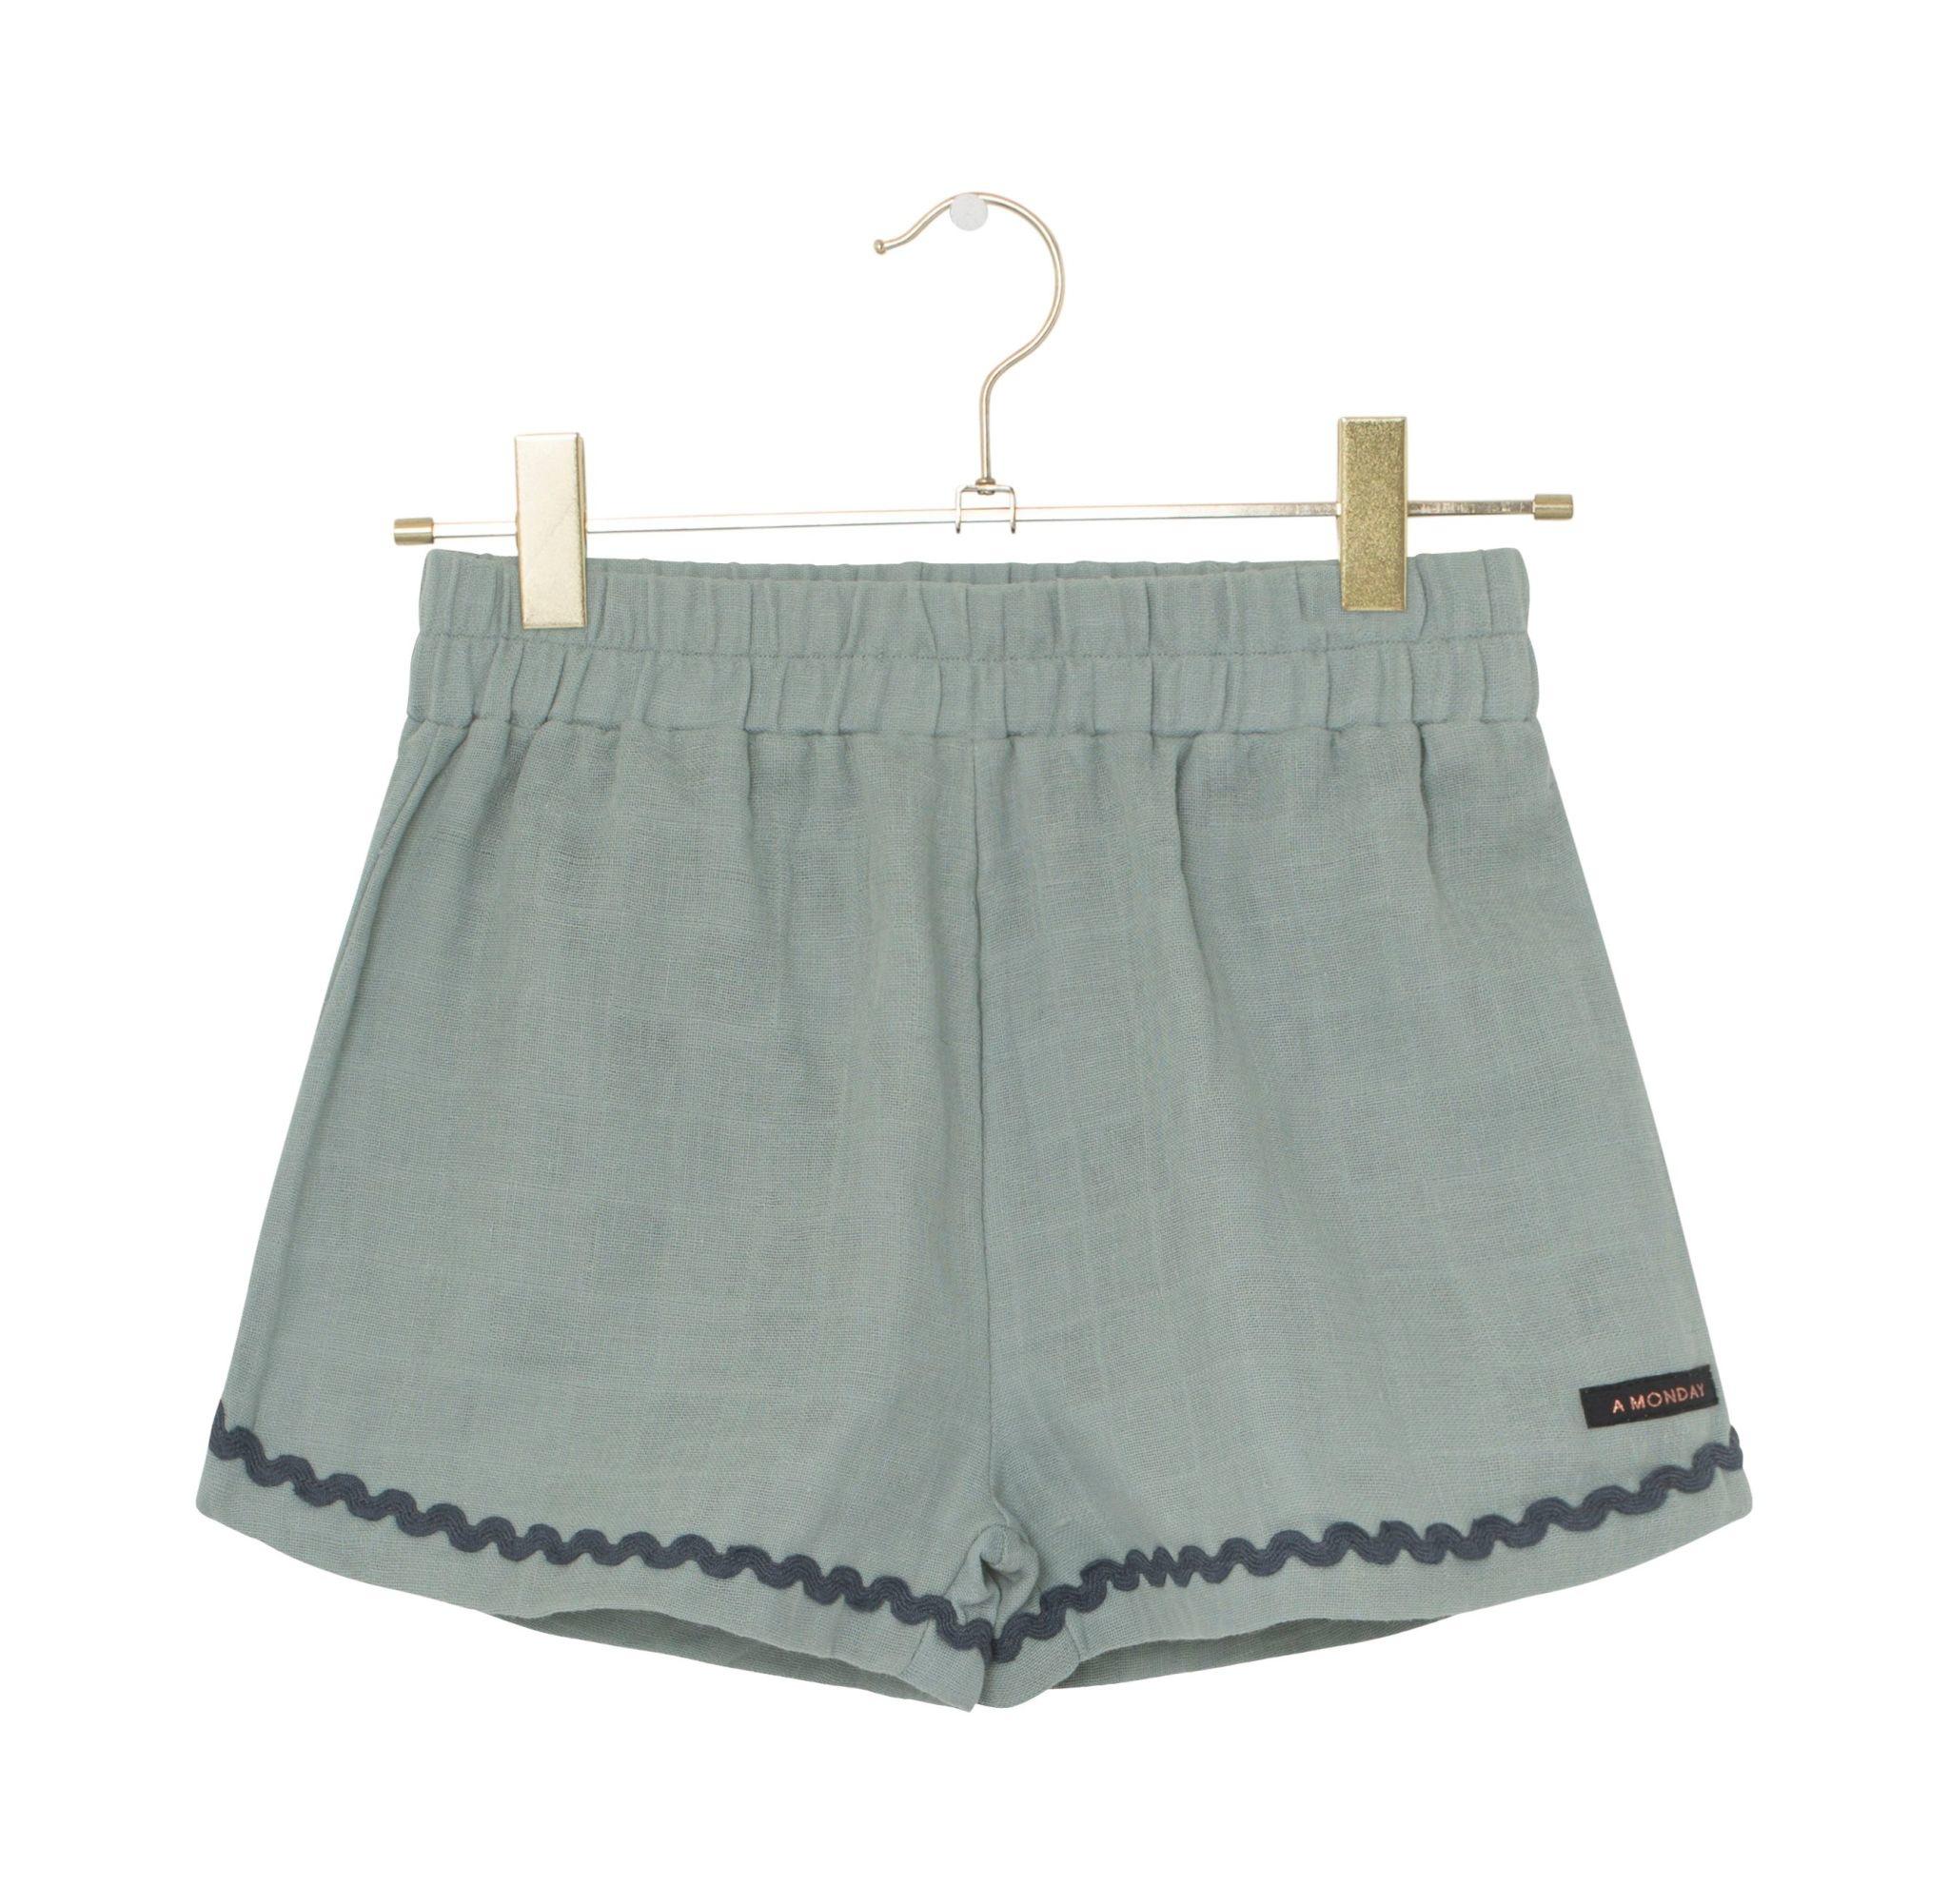 A Monday Gigi shorts Jadeite Green - A Monday